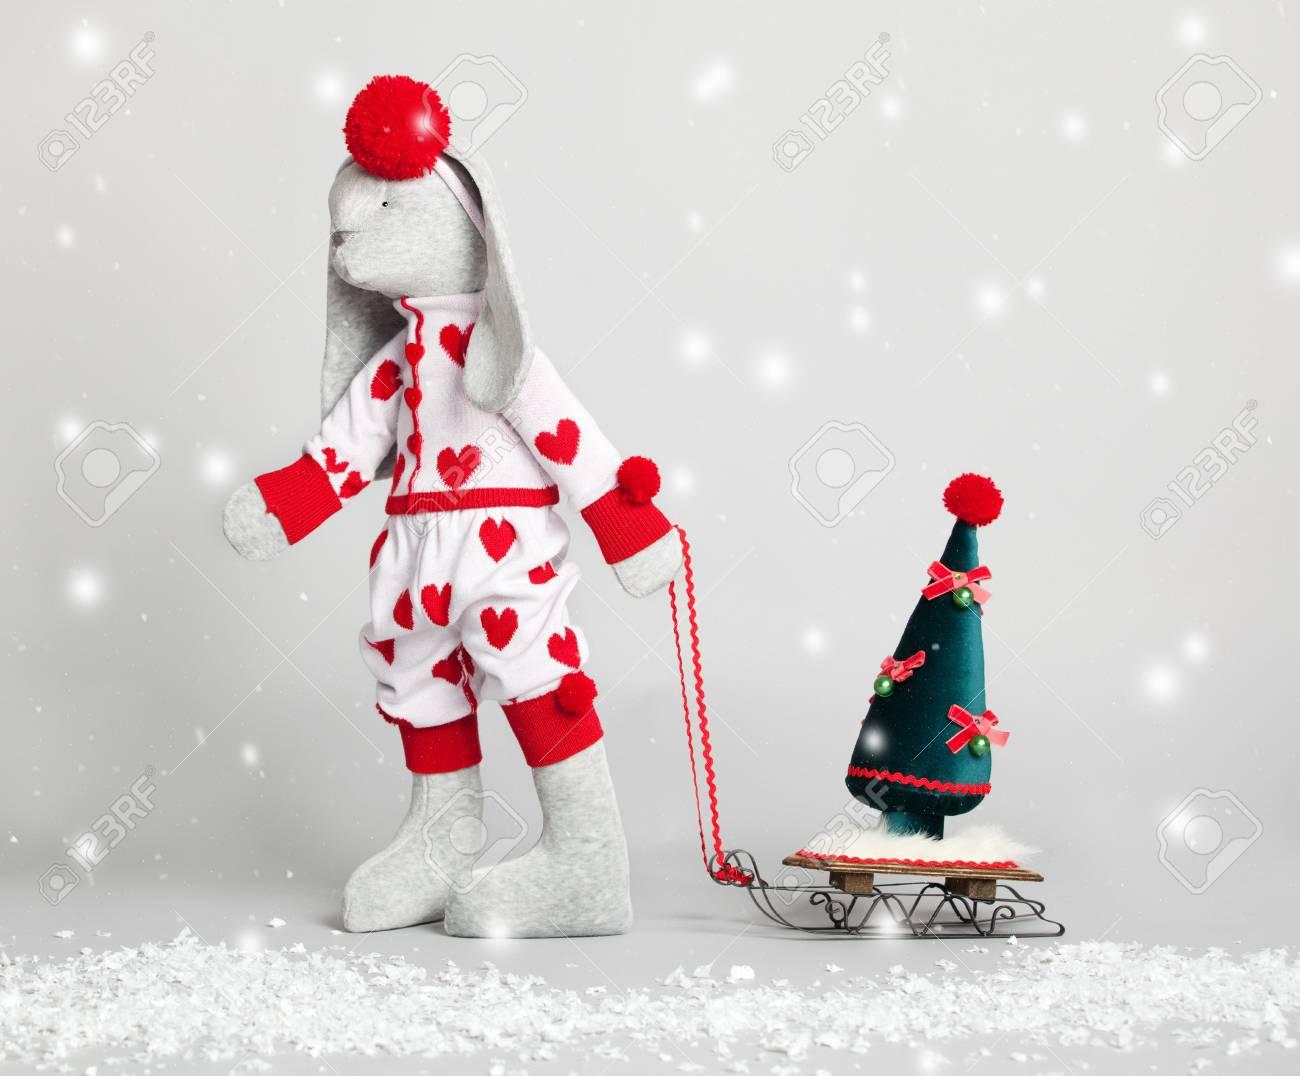 Hare dress up the tree. Christmas Card Stock Photo - 14852674